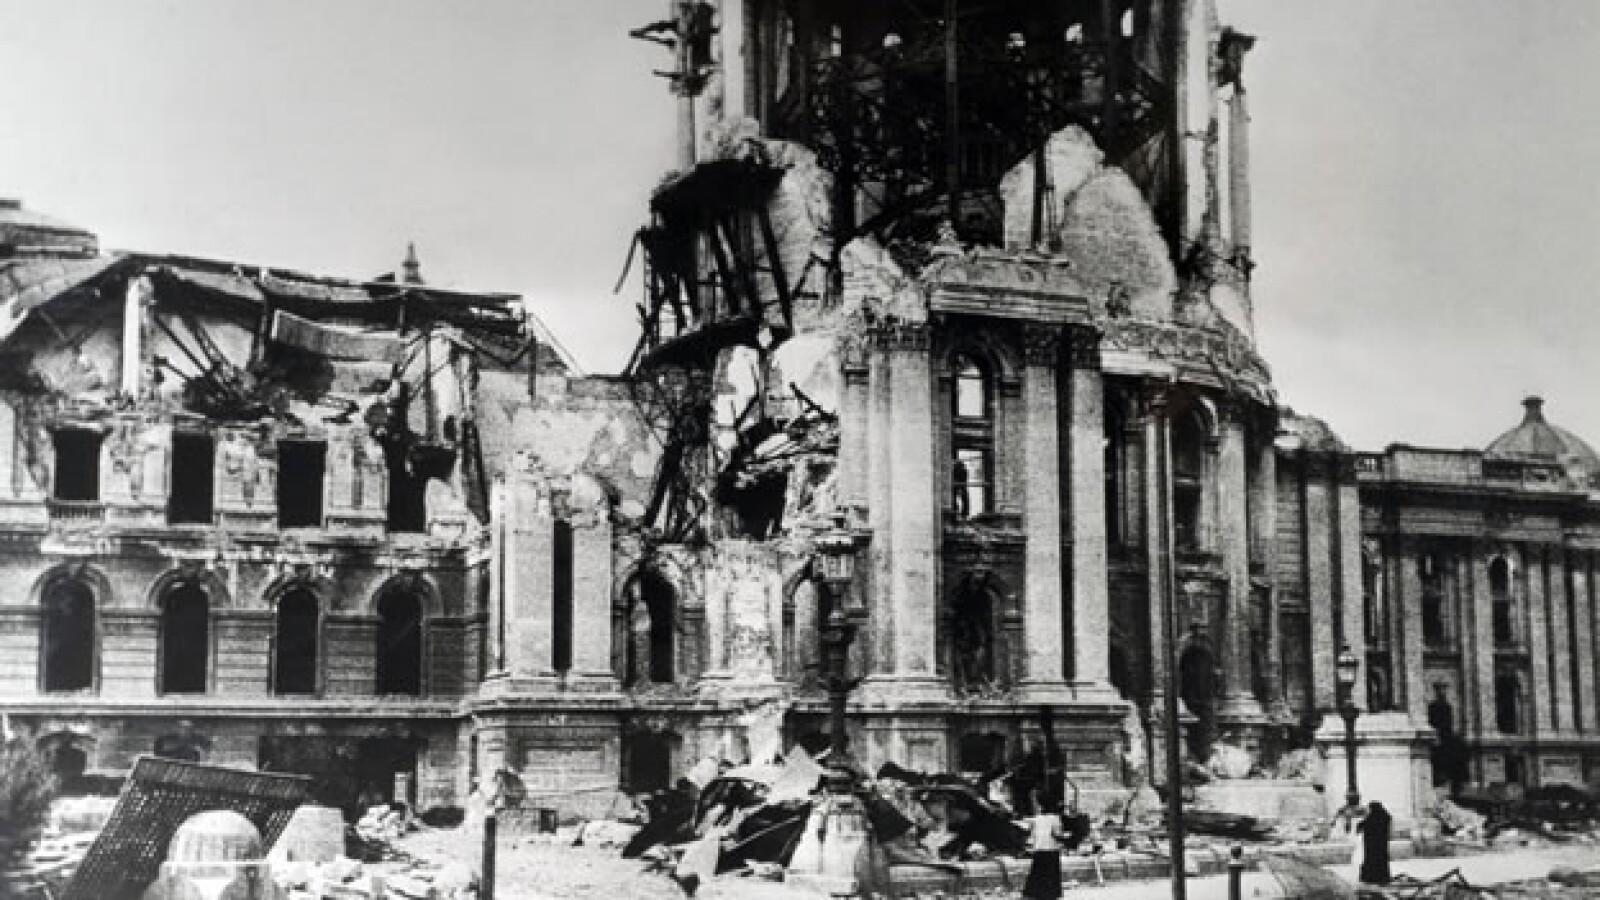 terremoto incendio san francisco eu 1906